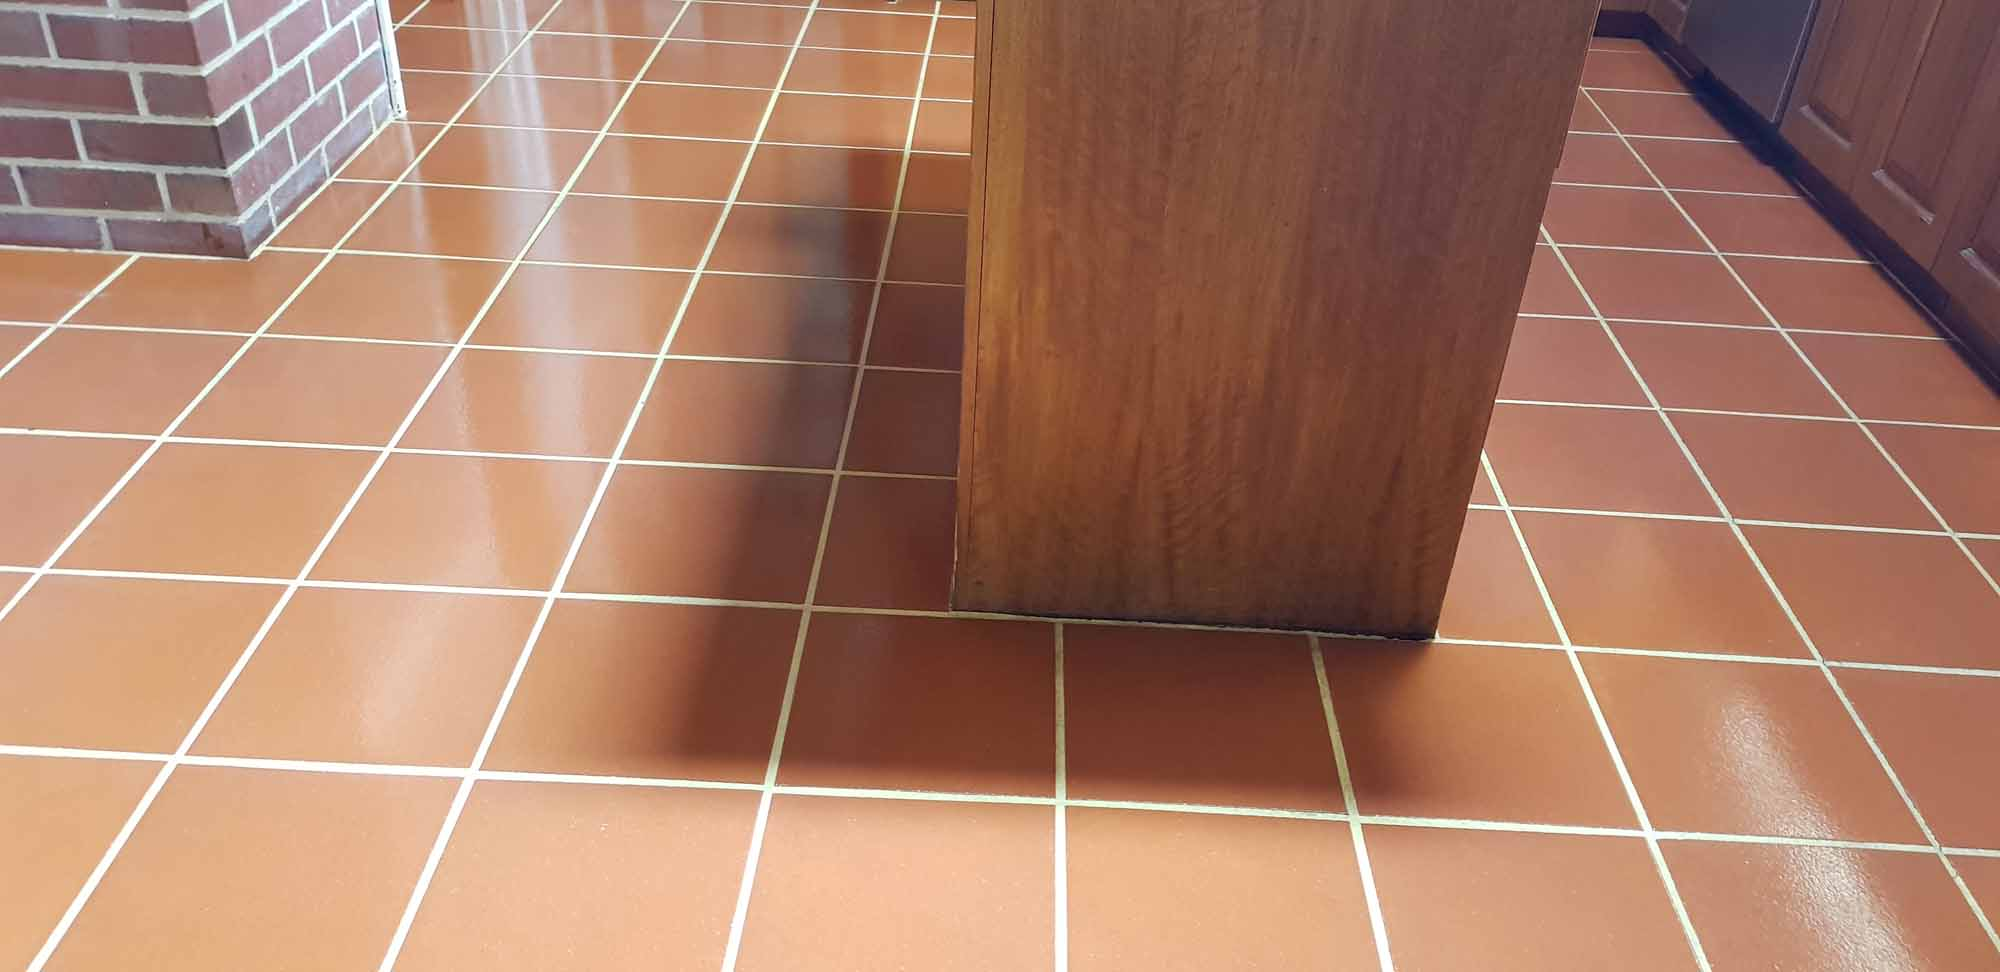 Terracotta Tile Cleaning & Sealing Perth WA